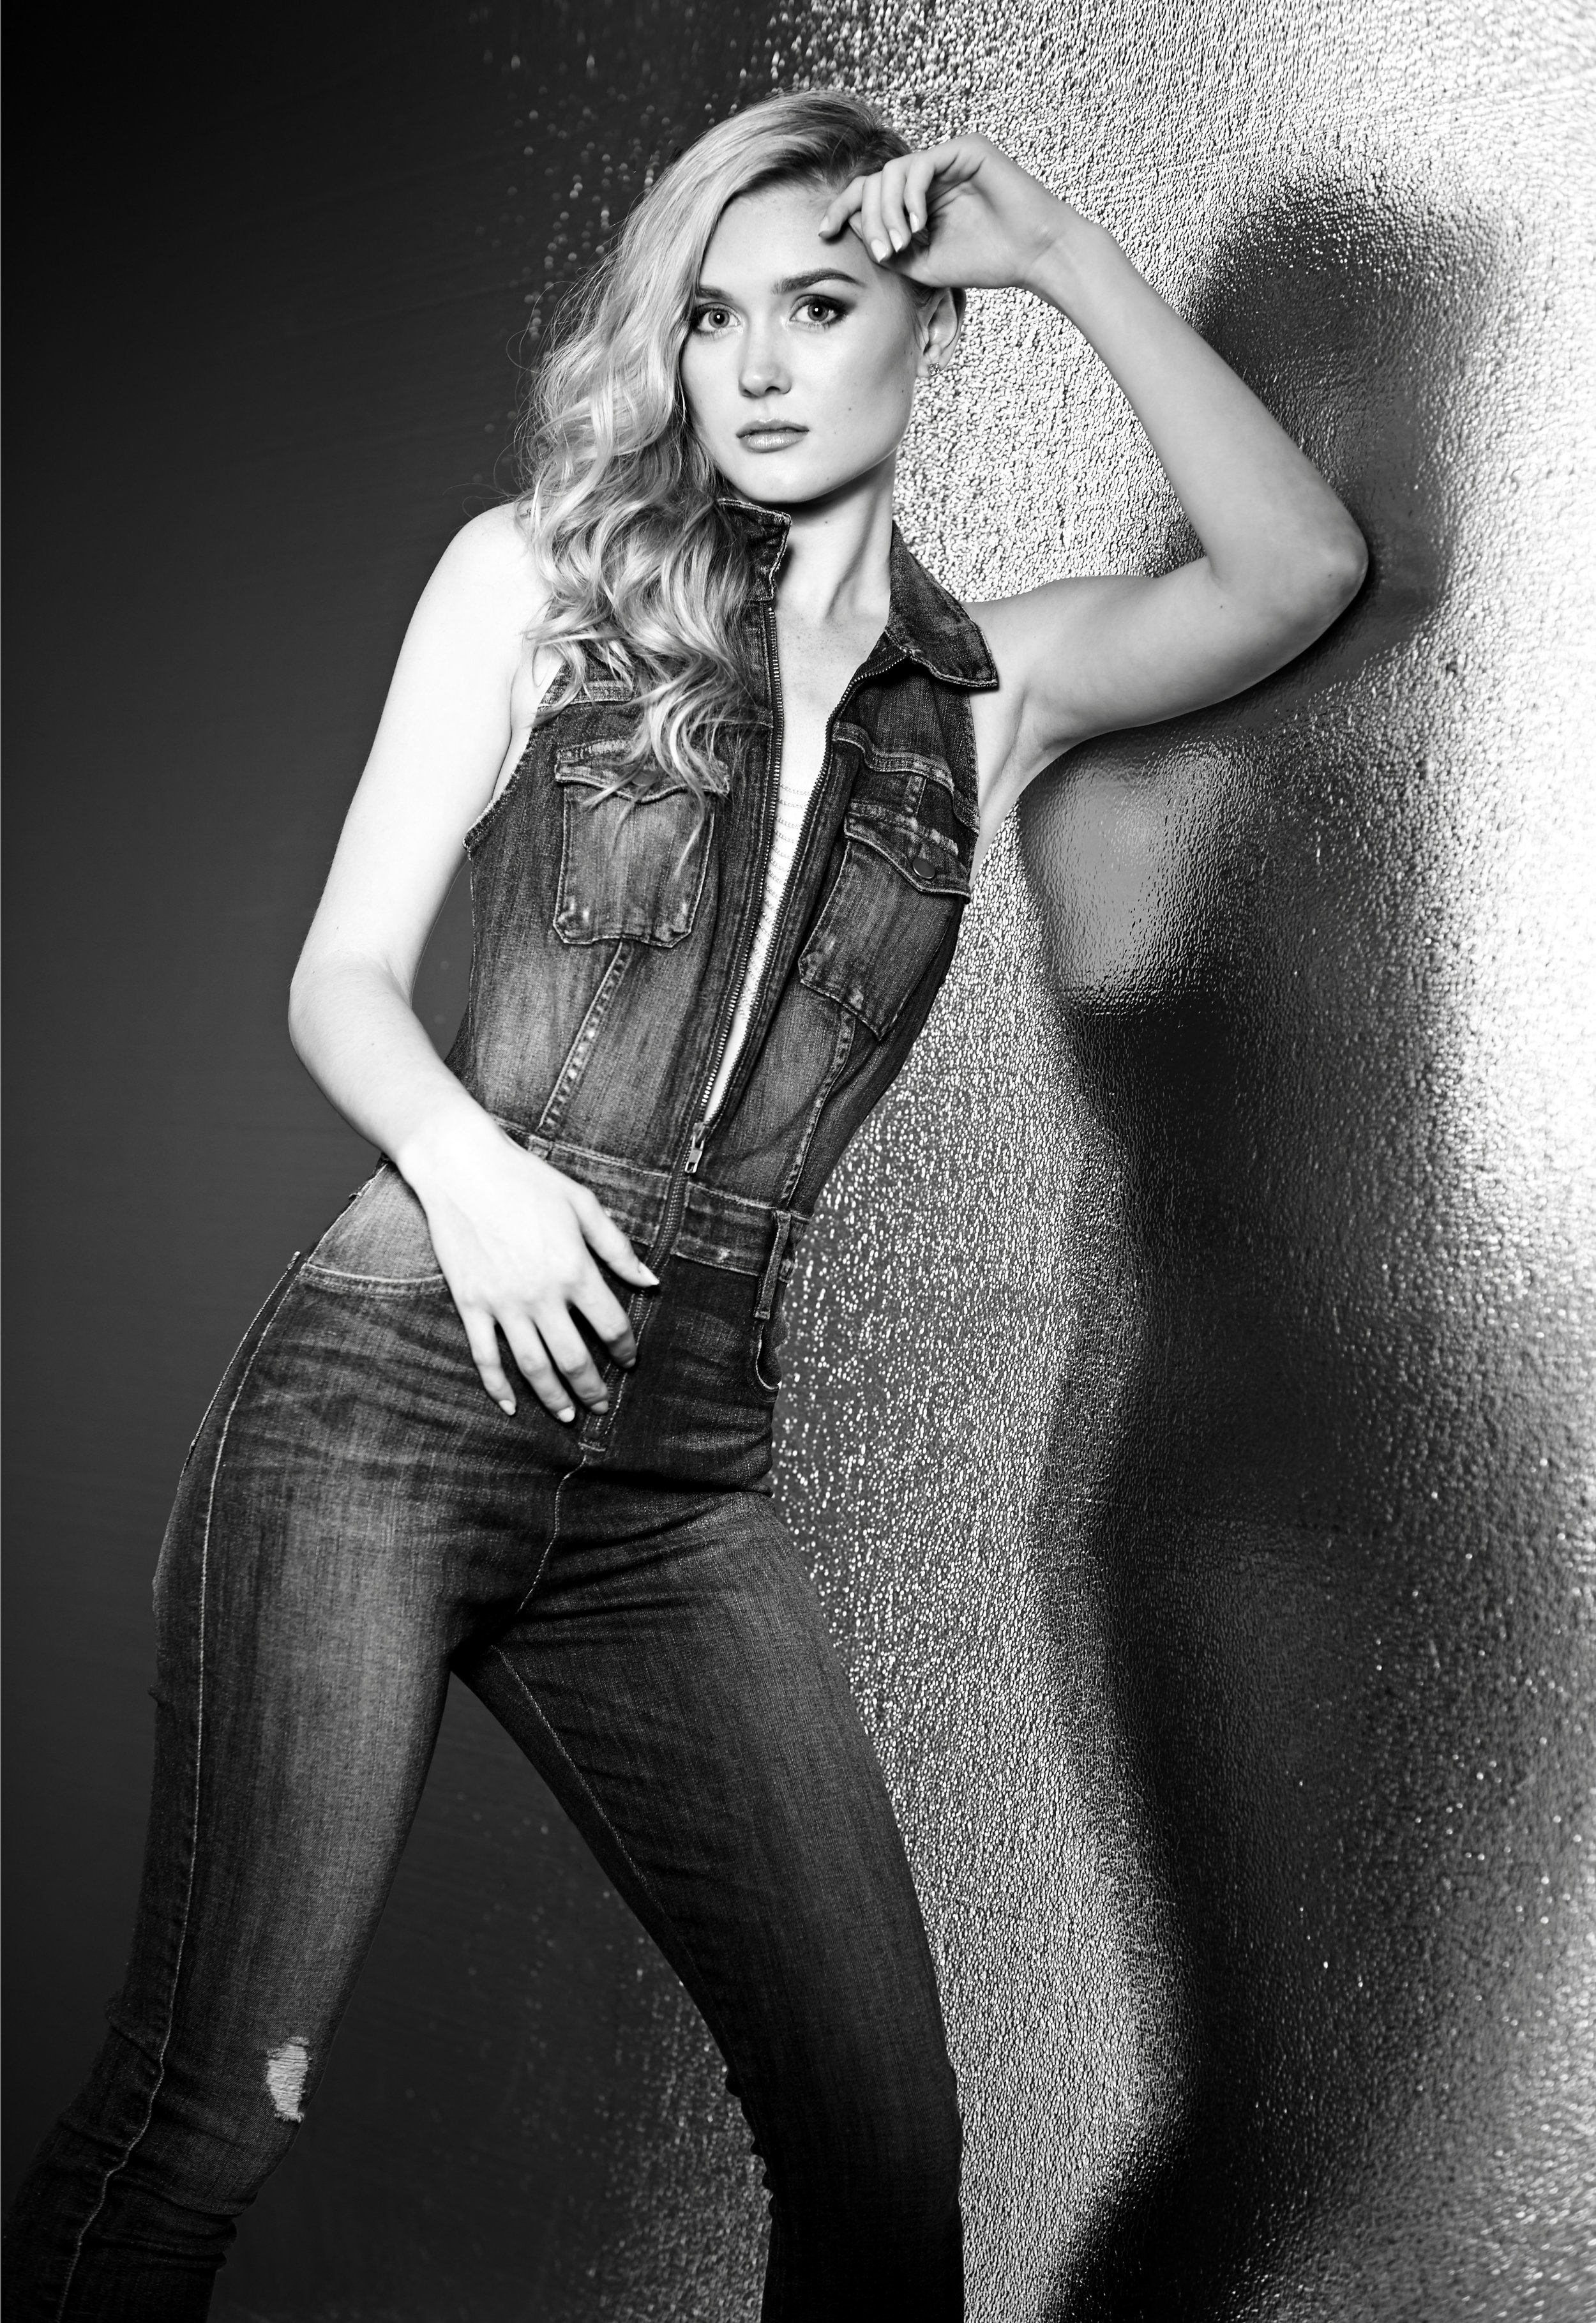 Marta-Hewson-Taylor-Greenaway-Model-Photoshoot-8304-B.jpg